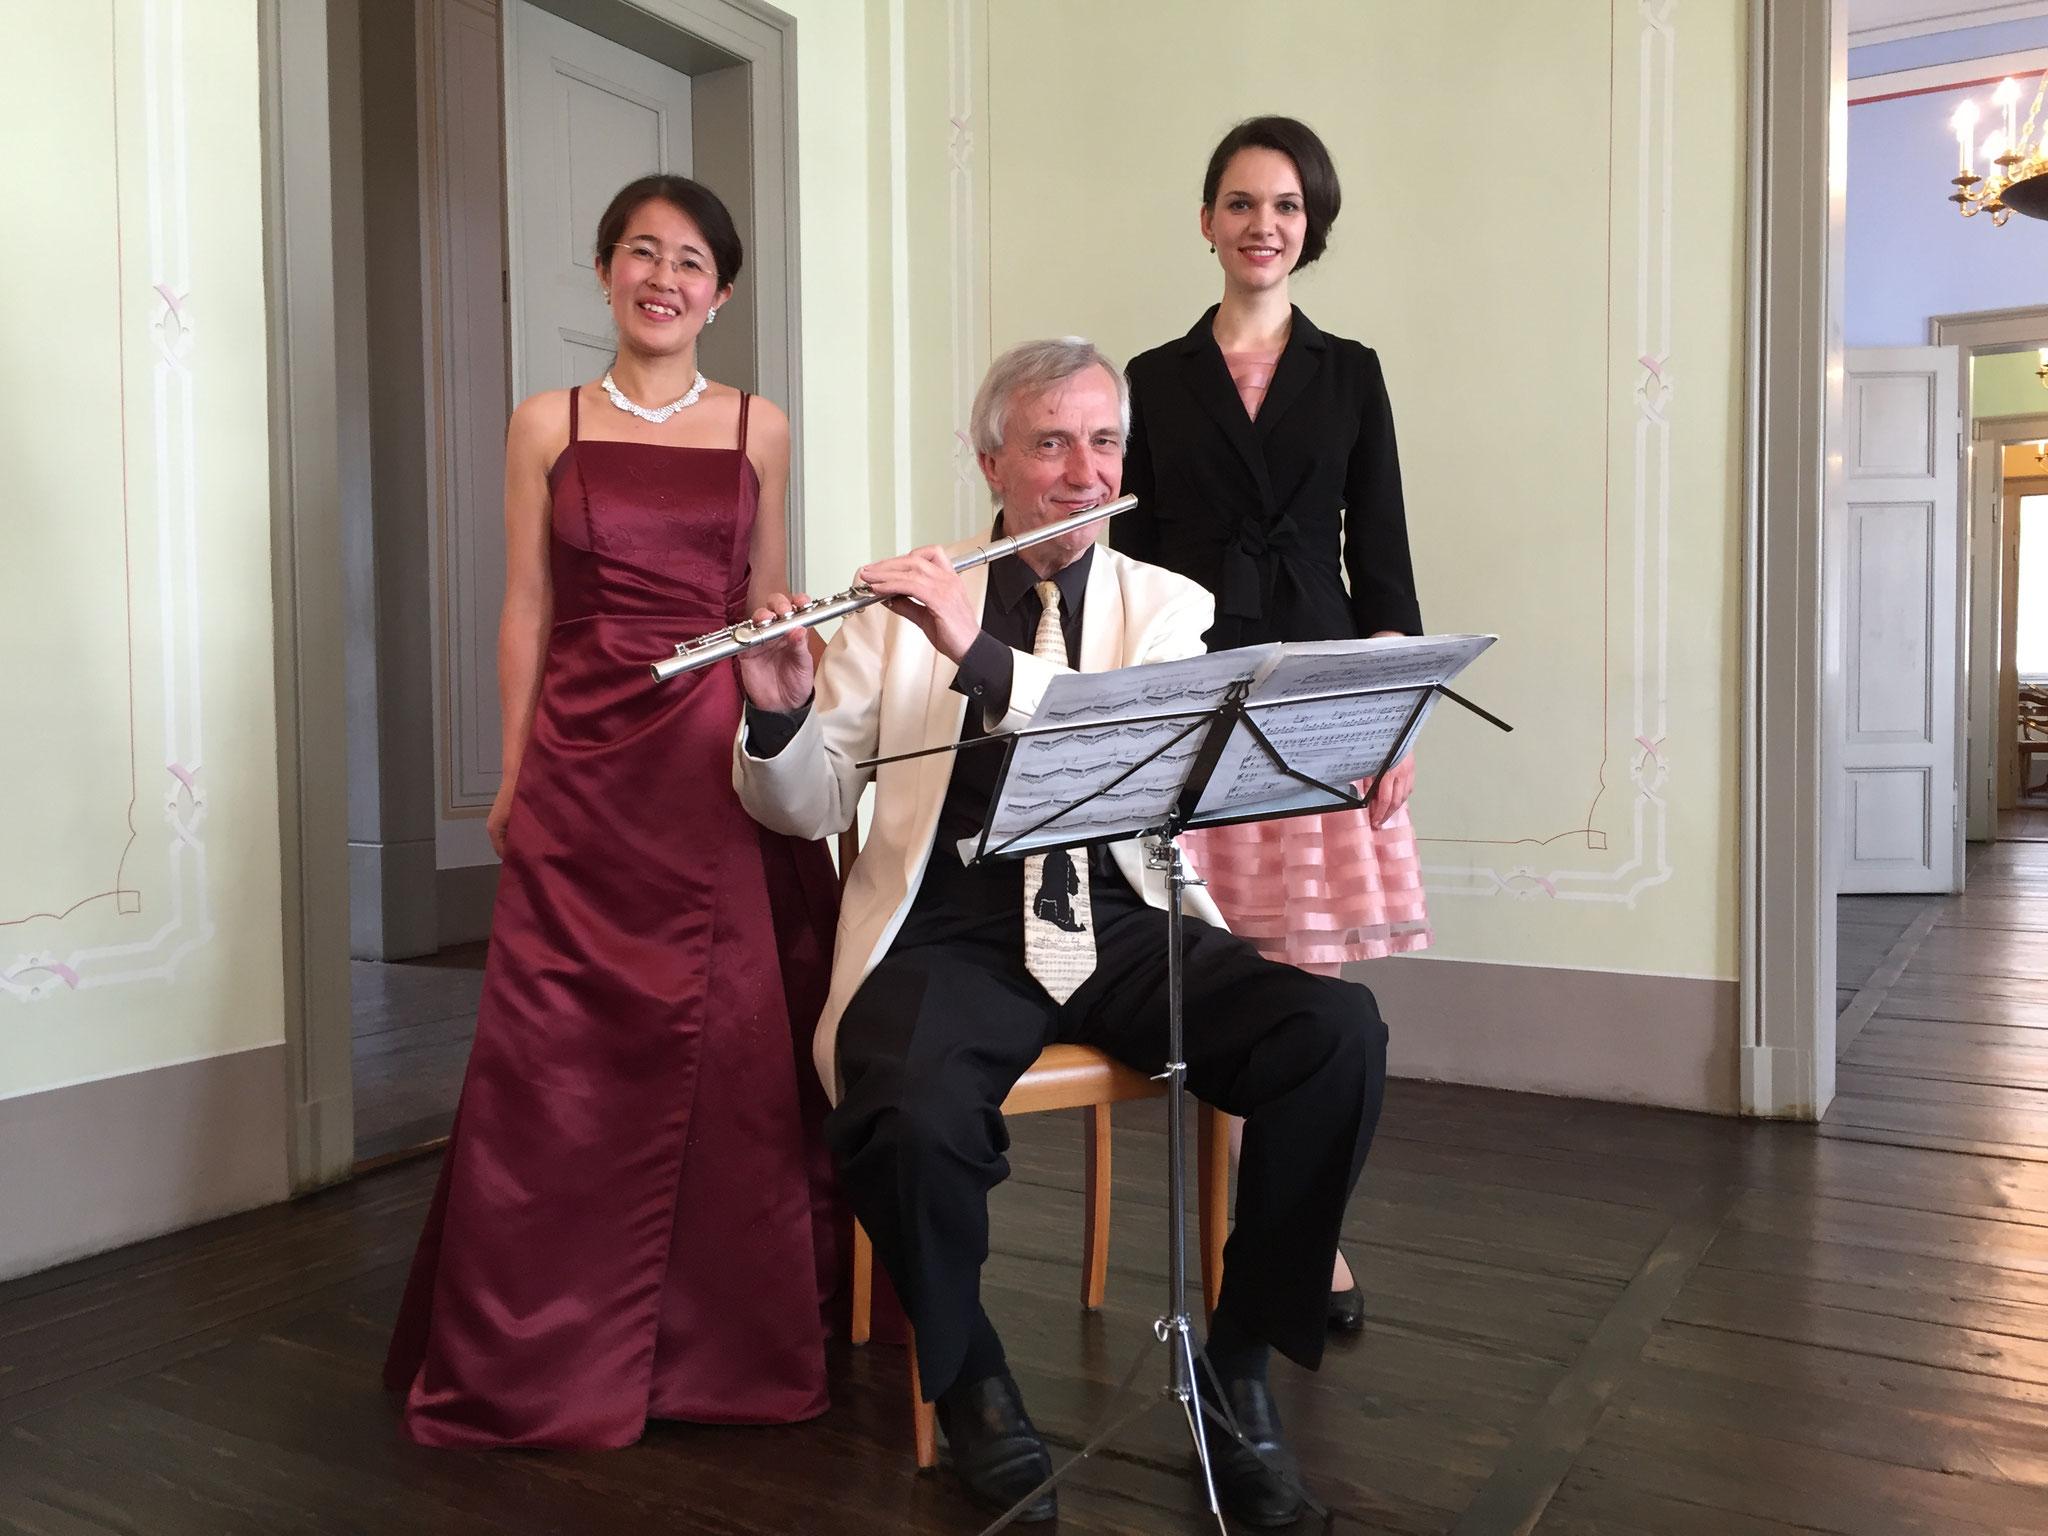 Trio Monika Rytz(Sopran), Klaus-Peter Riemer(Flöte) und Miyuki Brummer(Klavier) im Mendelssohn Haus Leipzig 2016 トリオ モニカ・リッツ(ソプラノ)、クラウス ペーター・リーマー(フルート)、ブルマー美由紀(ピアノ) ライプツィッヒのメンデルスゾーン・ハウスにて 2016年